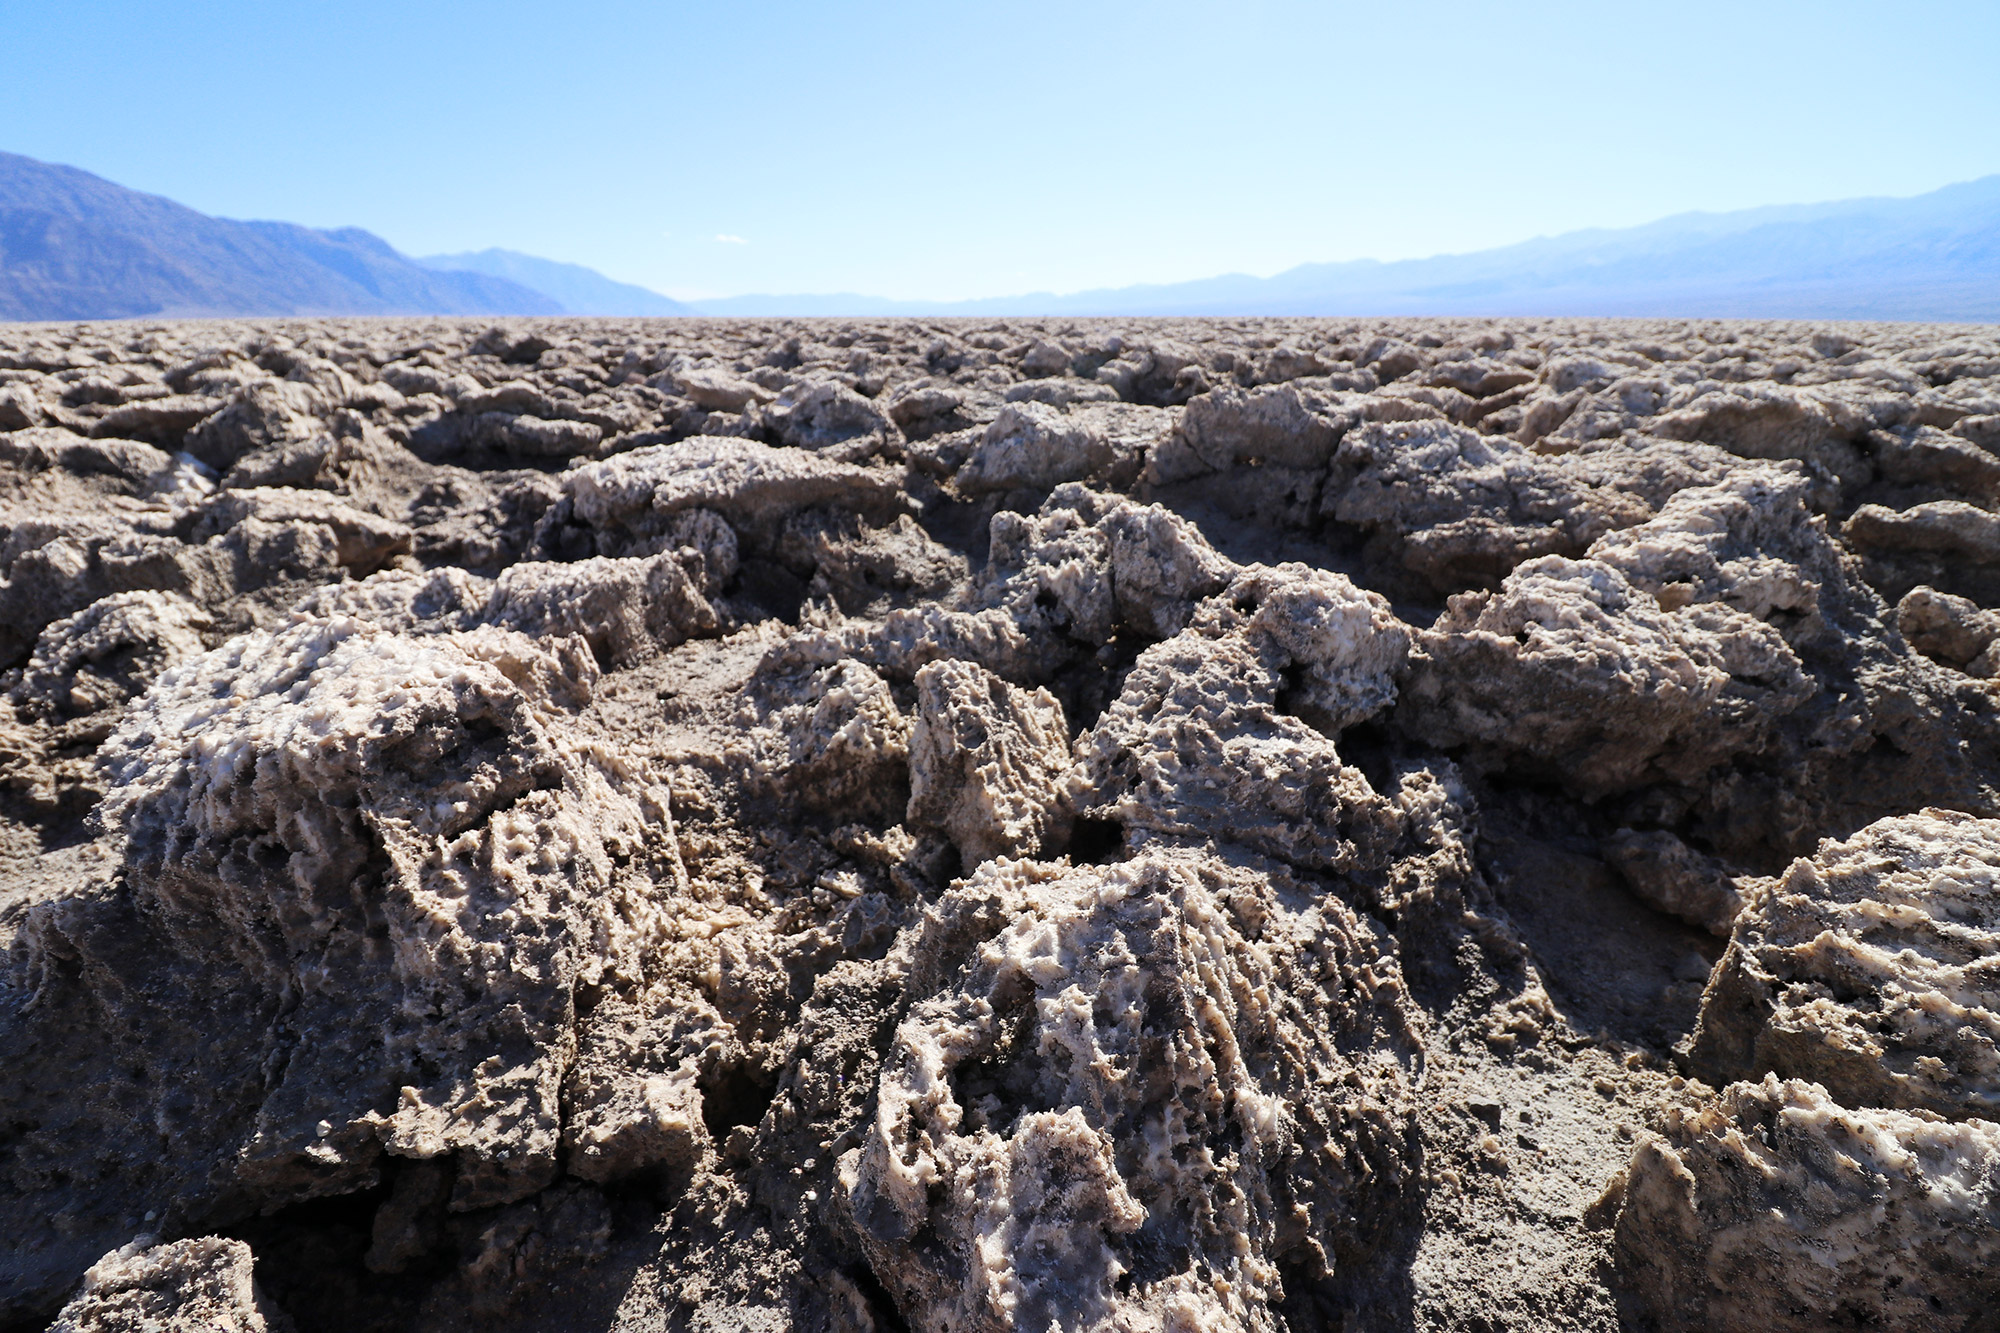 Amerika dag 18 - Death Valley National Park - Devil's Golf Courrse